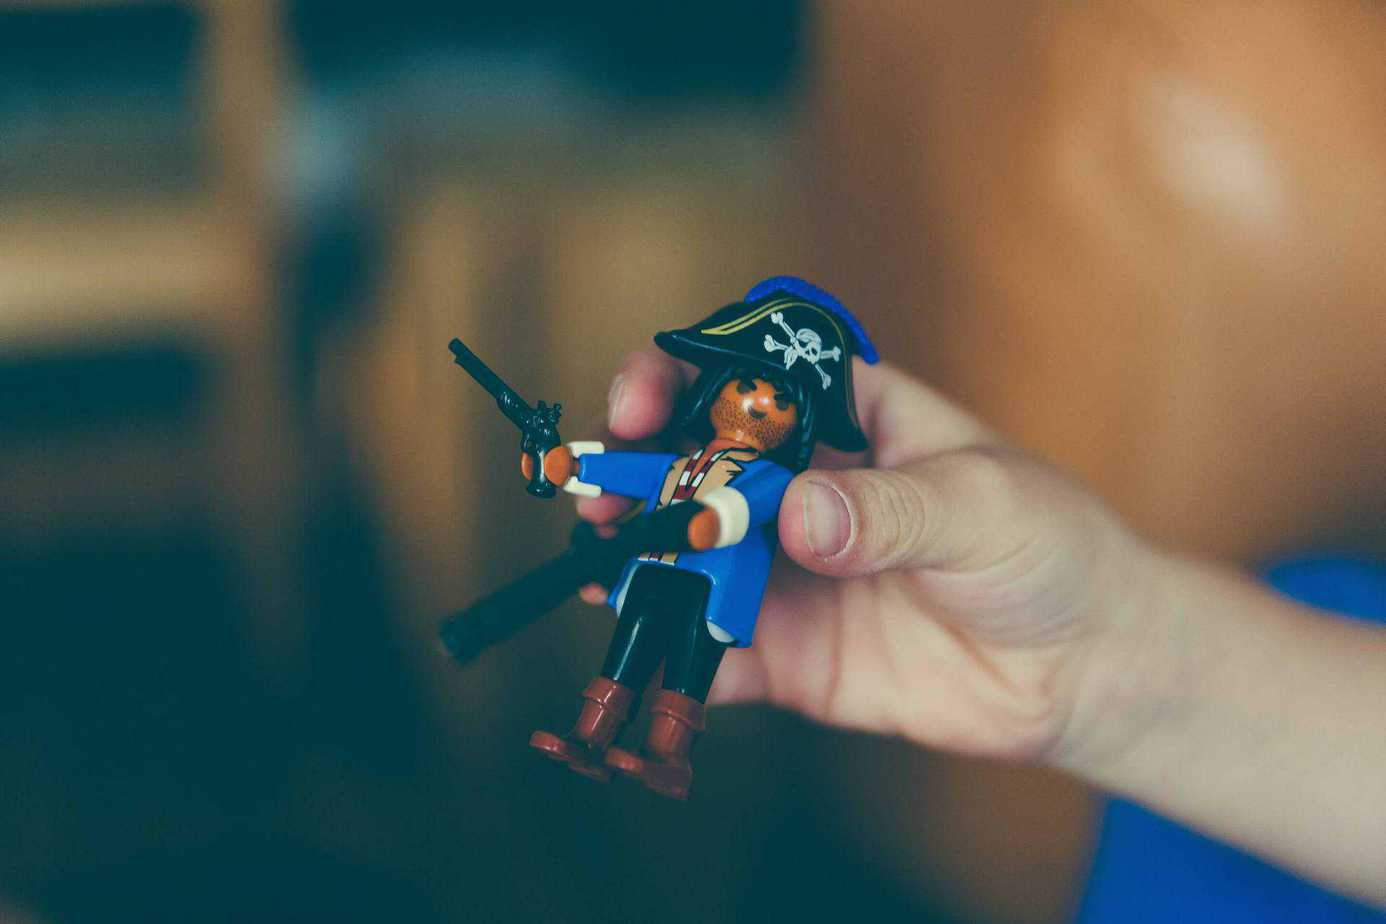 Instagram piraten